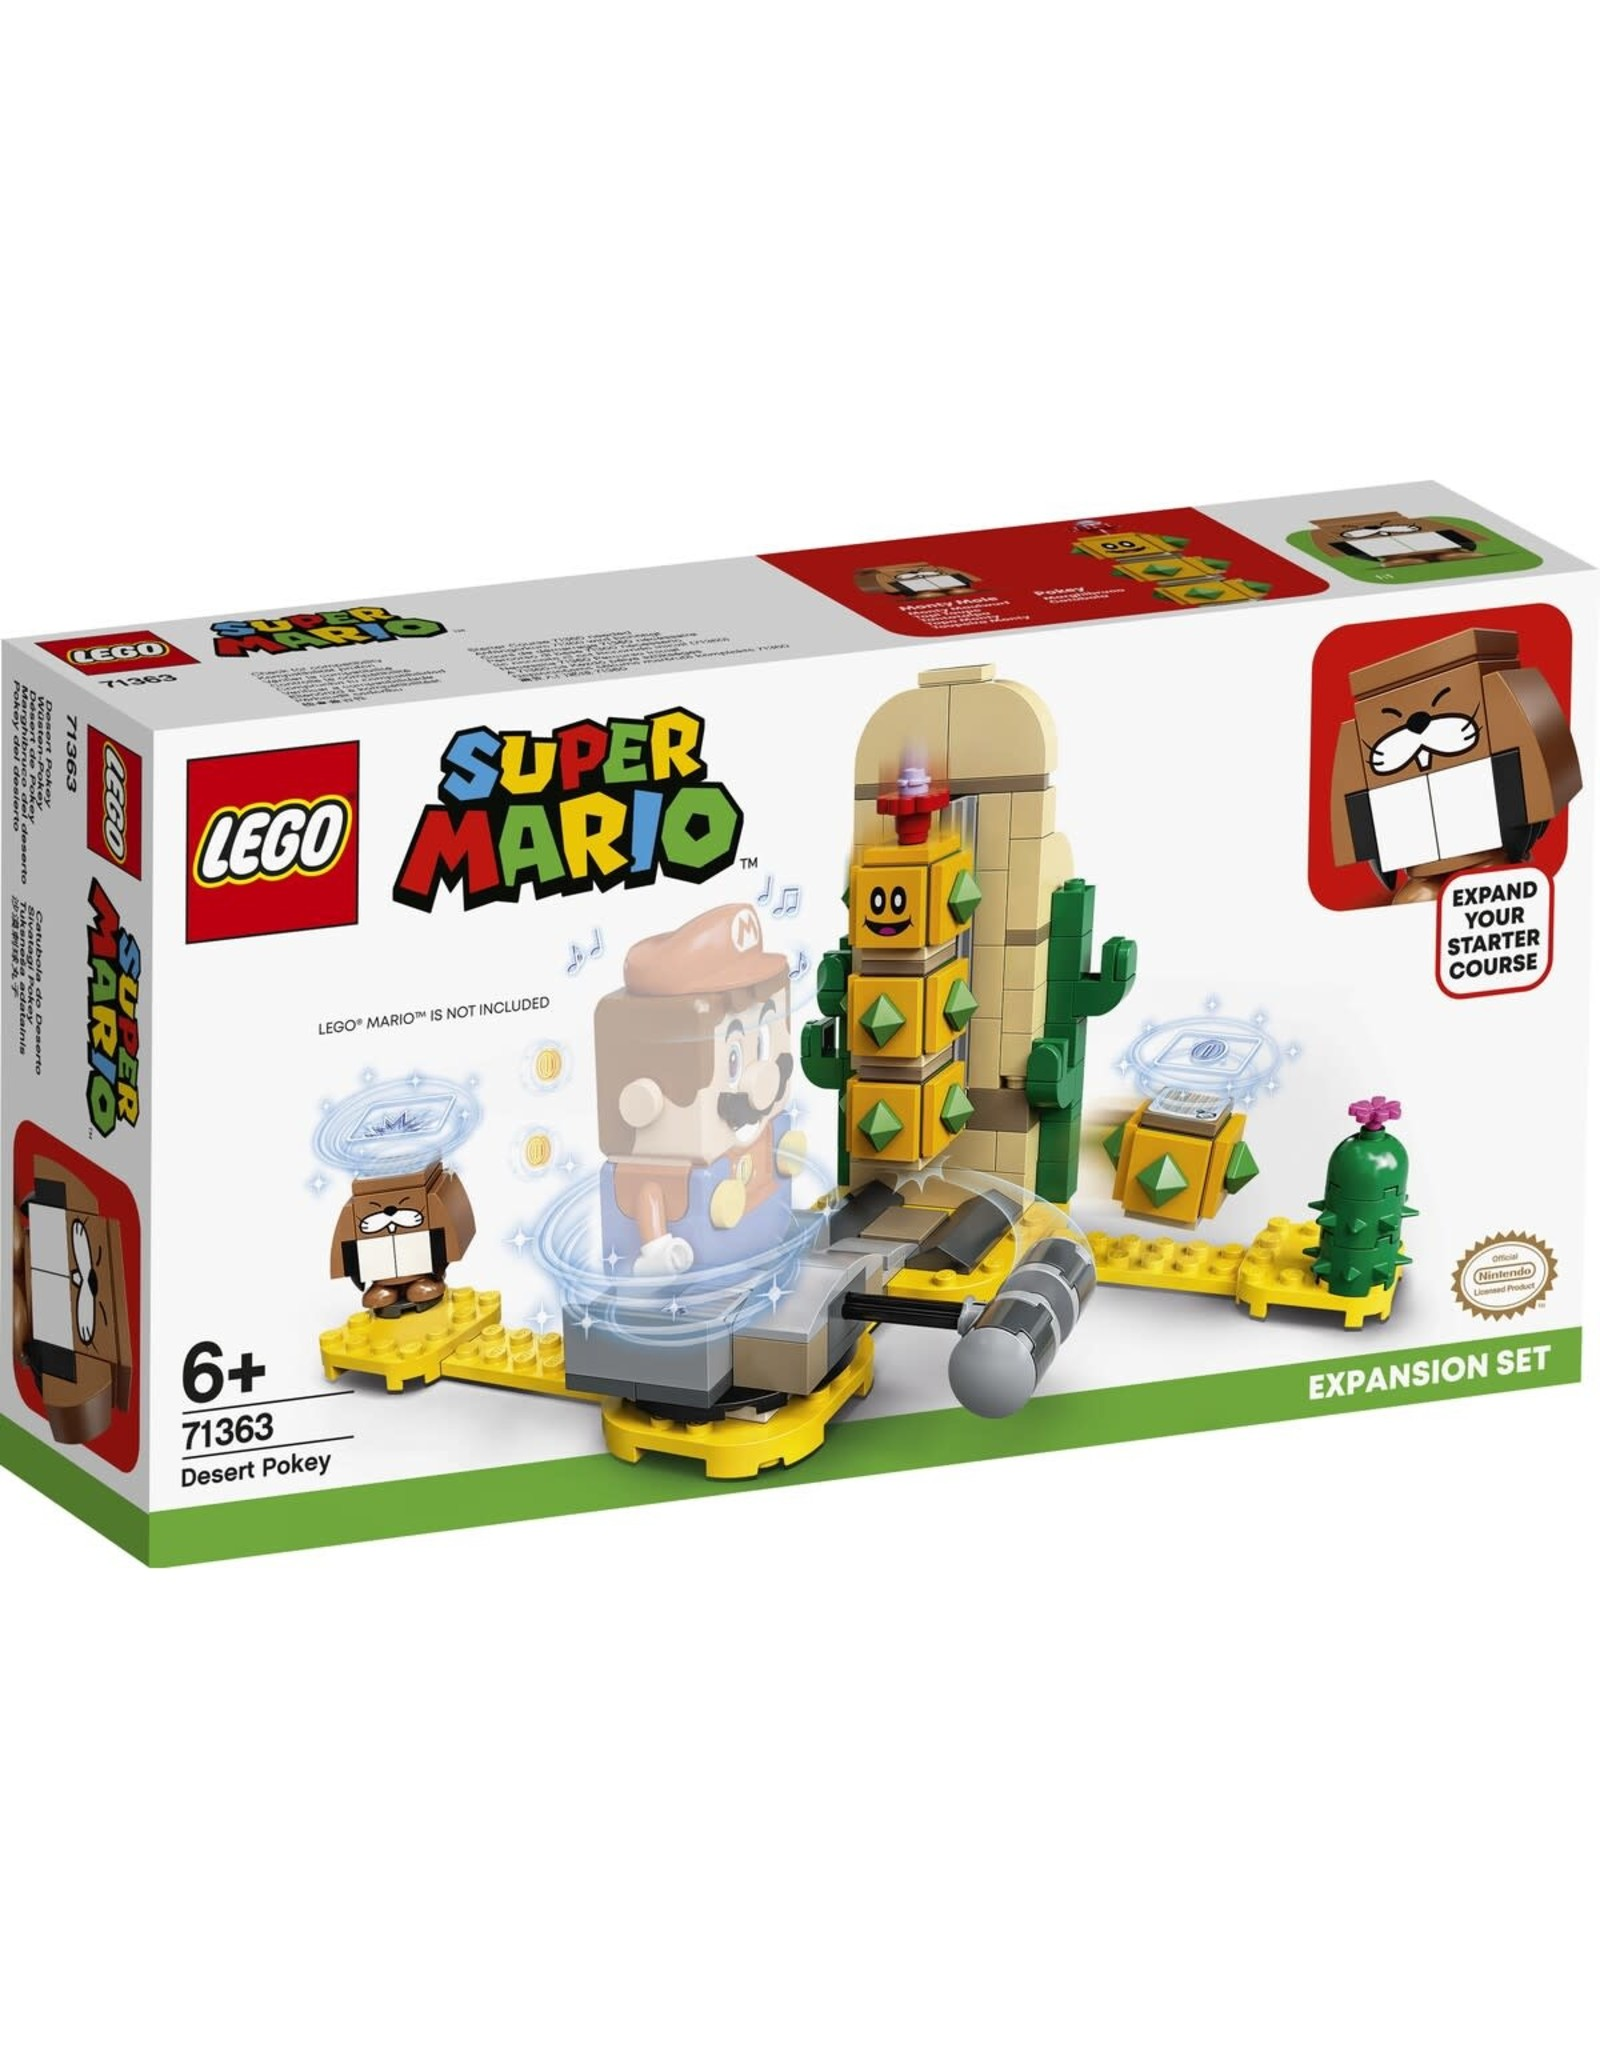 LEGO Desert Pokey Expansion Set